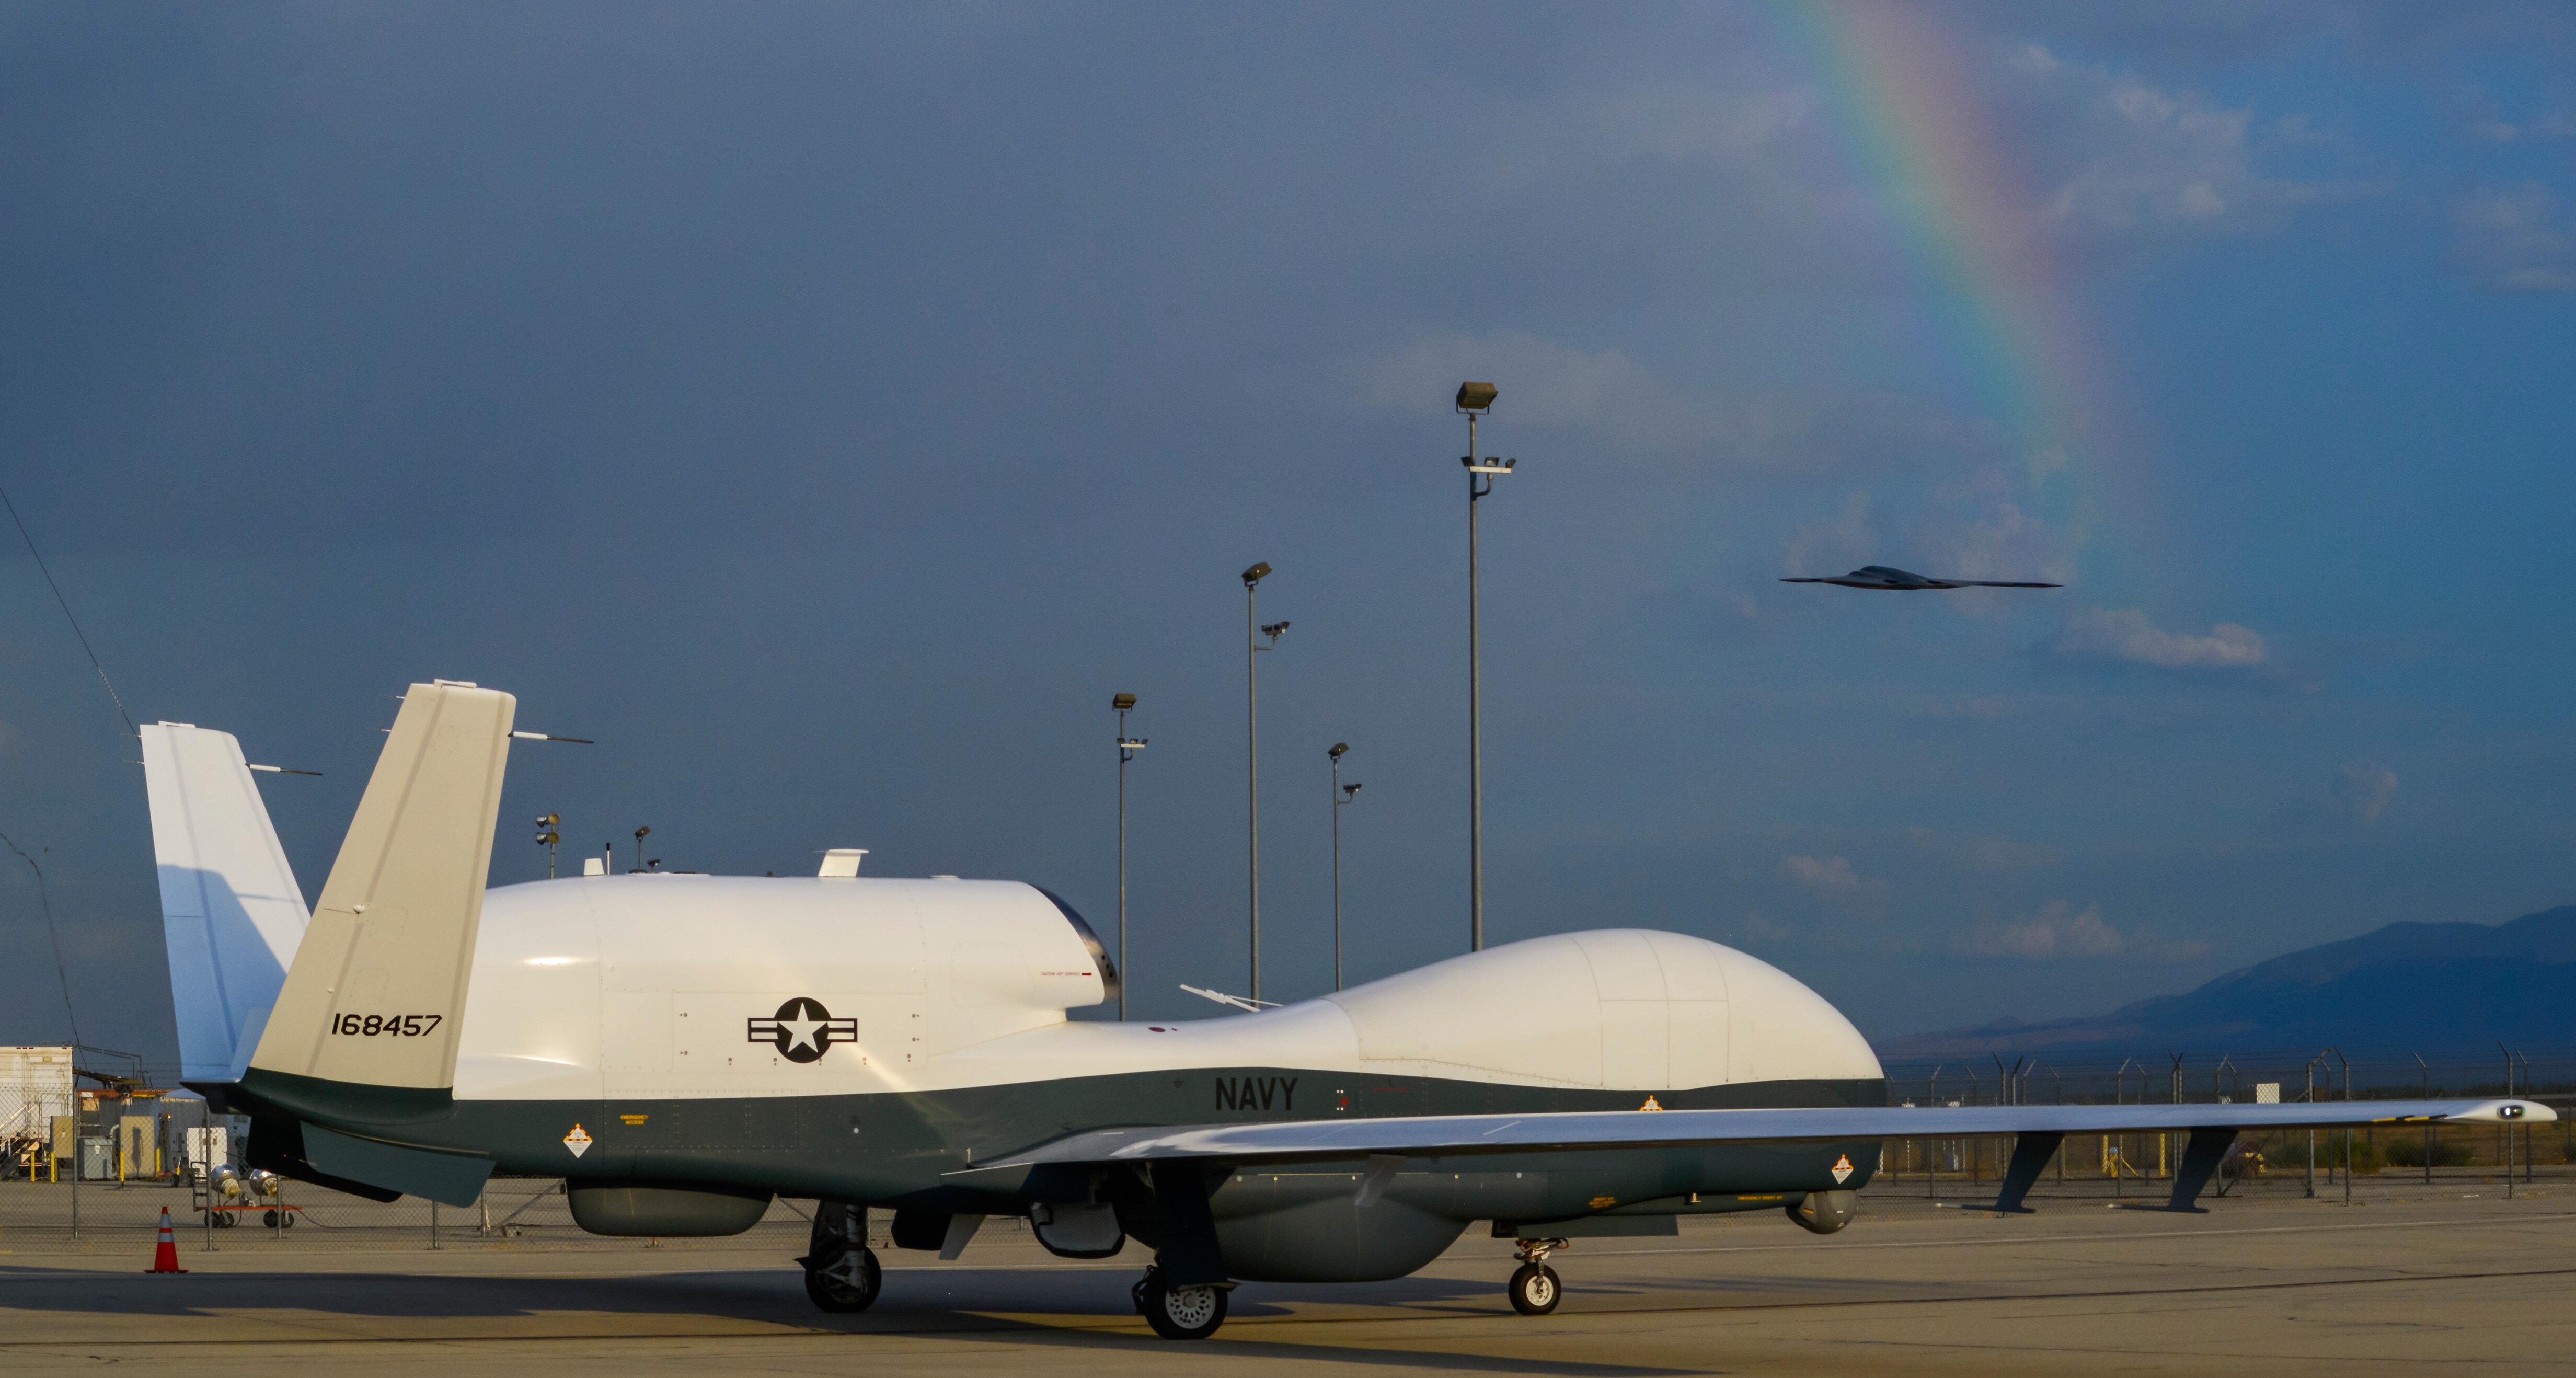 İran tarafından düşürülen ABD uçağı. (Fotoğraf: Arşiv)